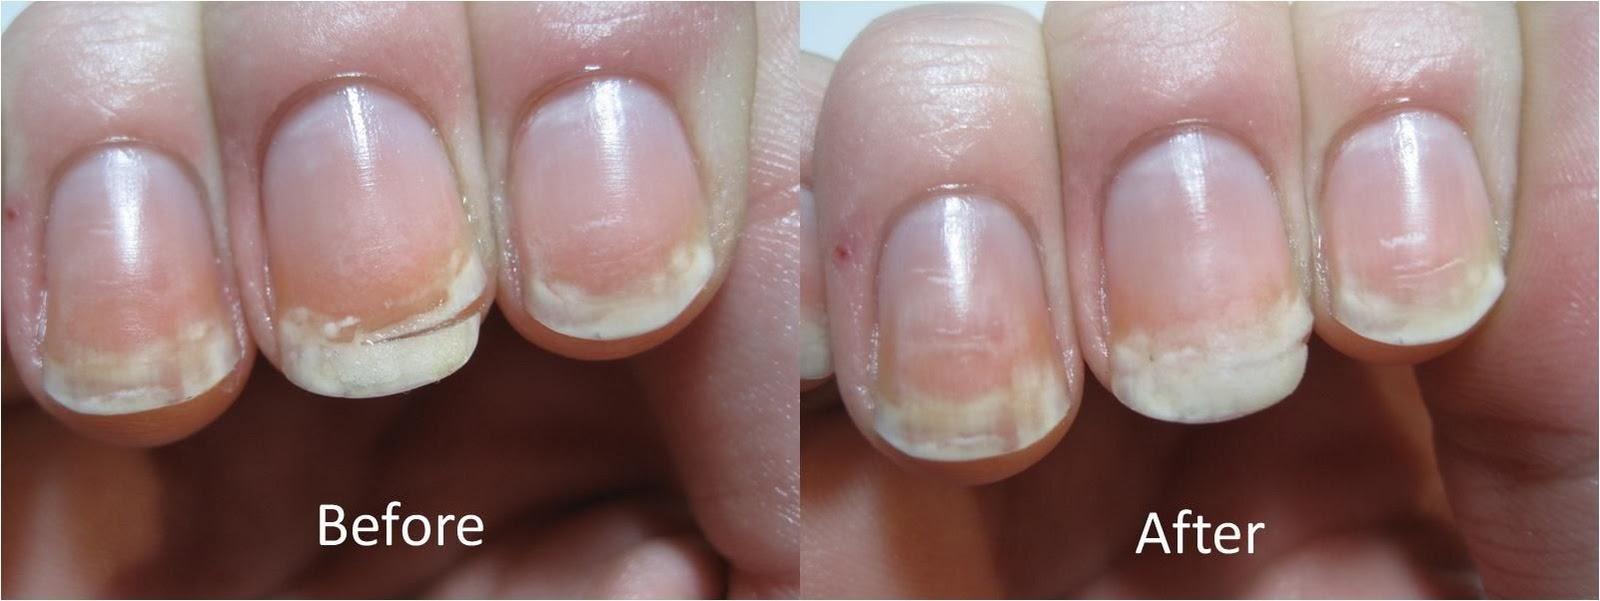 Nail Repair: Nail Repair After Biting